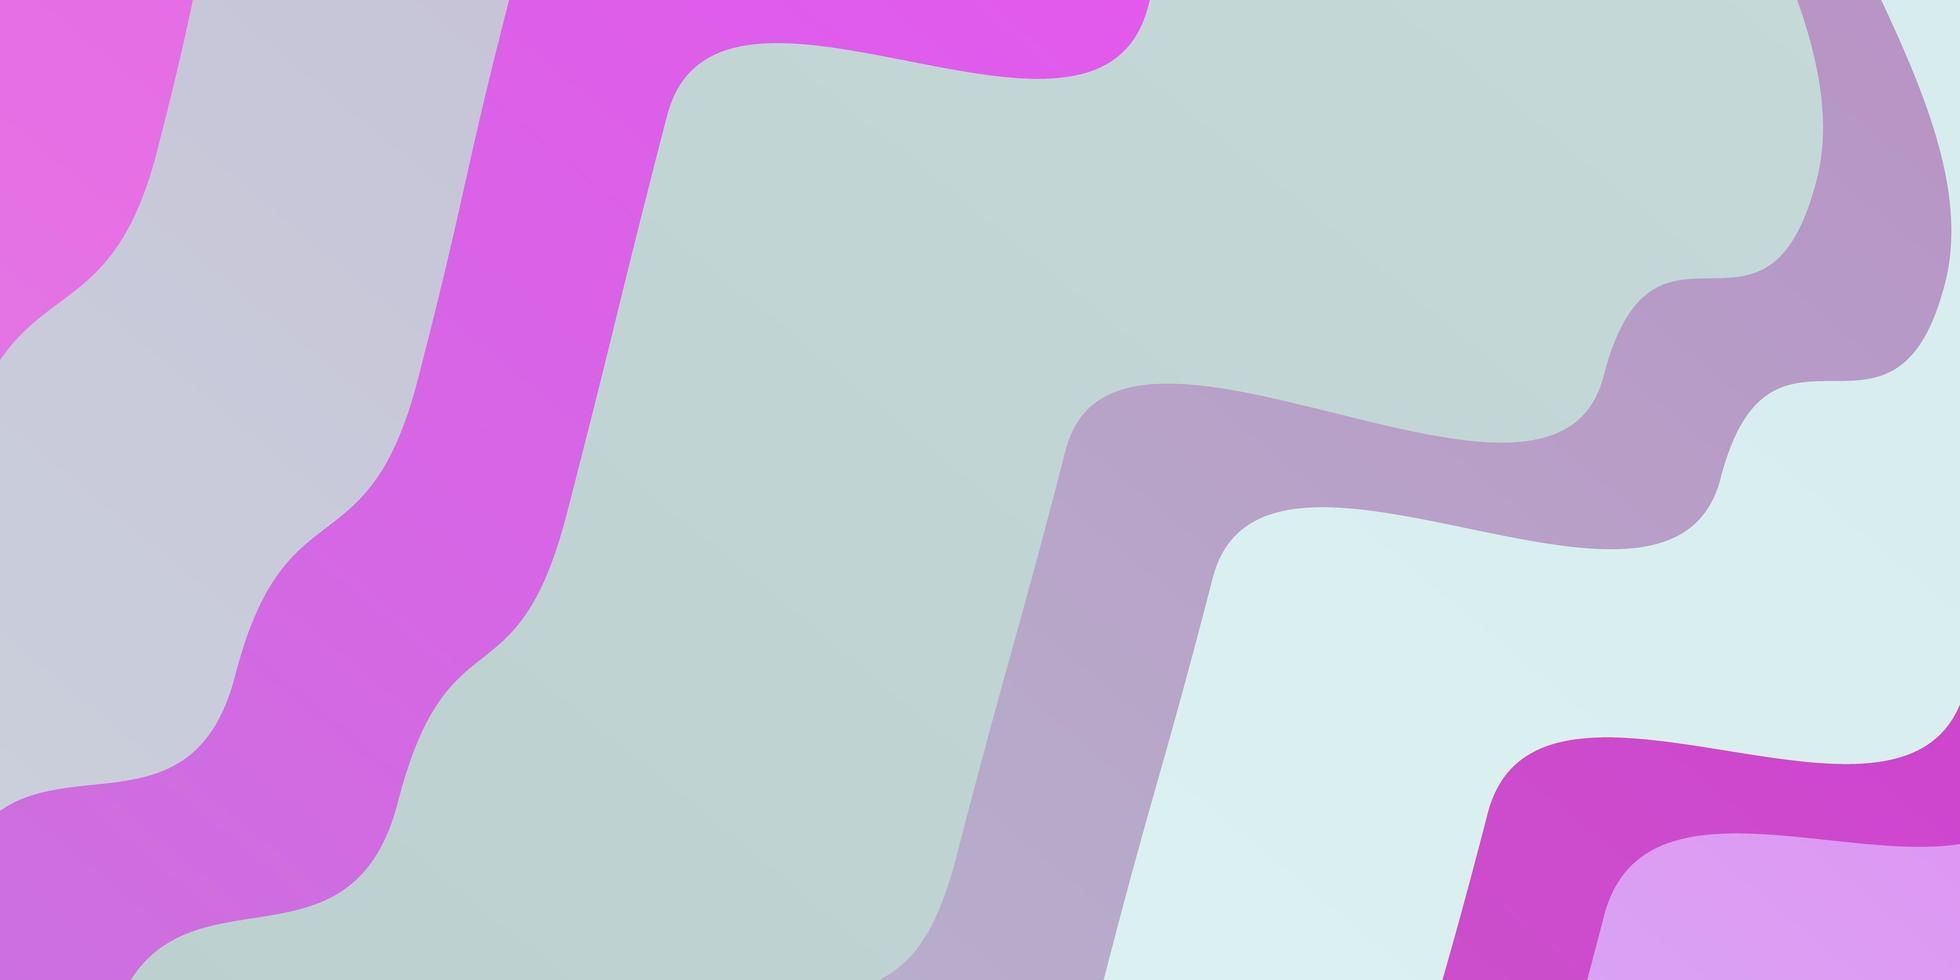 Fondo de vector de color rosa claro, azul con líneas dobladas.